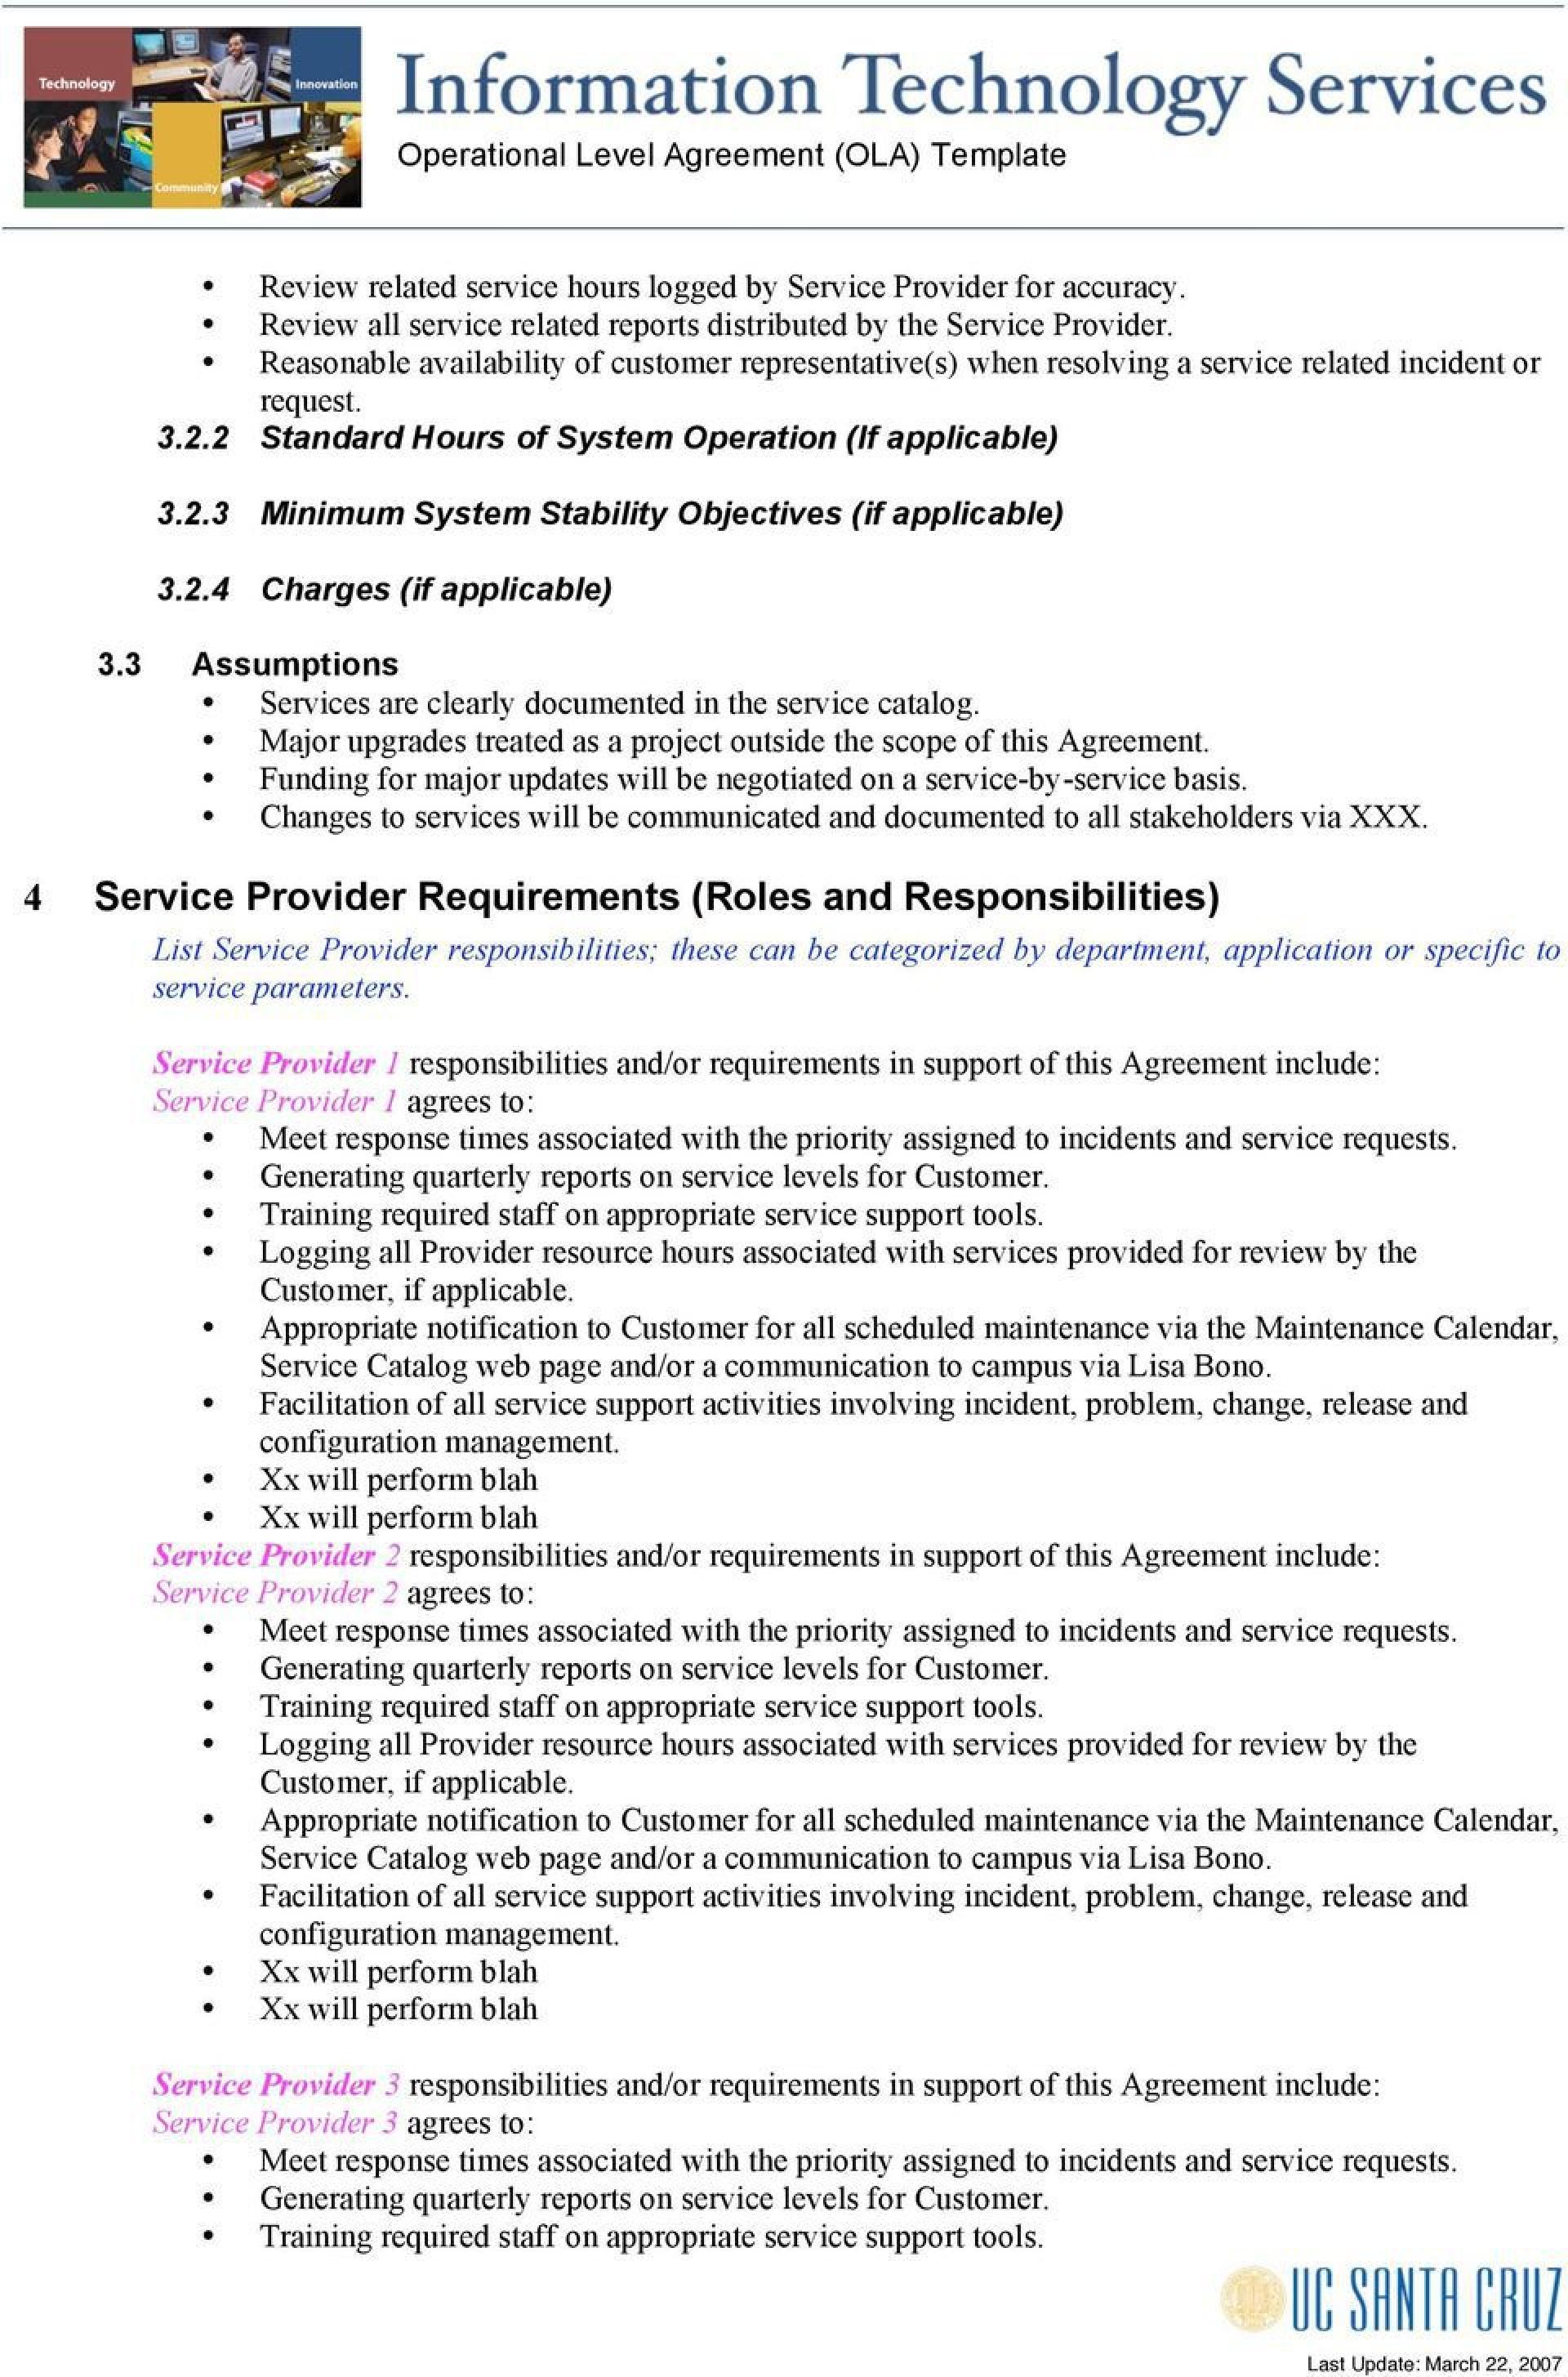 005 Beautiful Service Level Agreement Template High Def  South Africa Nz For Website Development1920